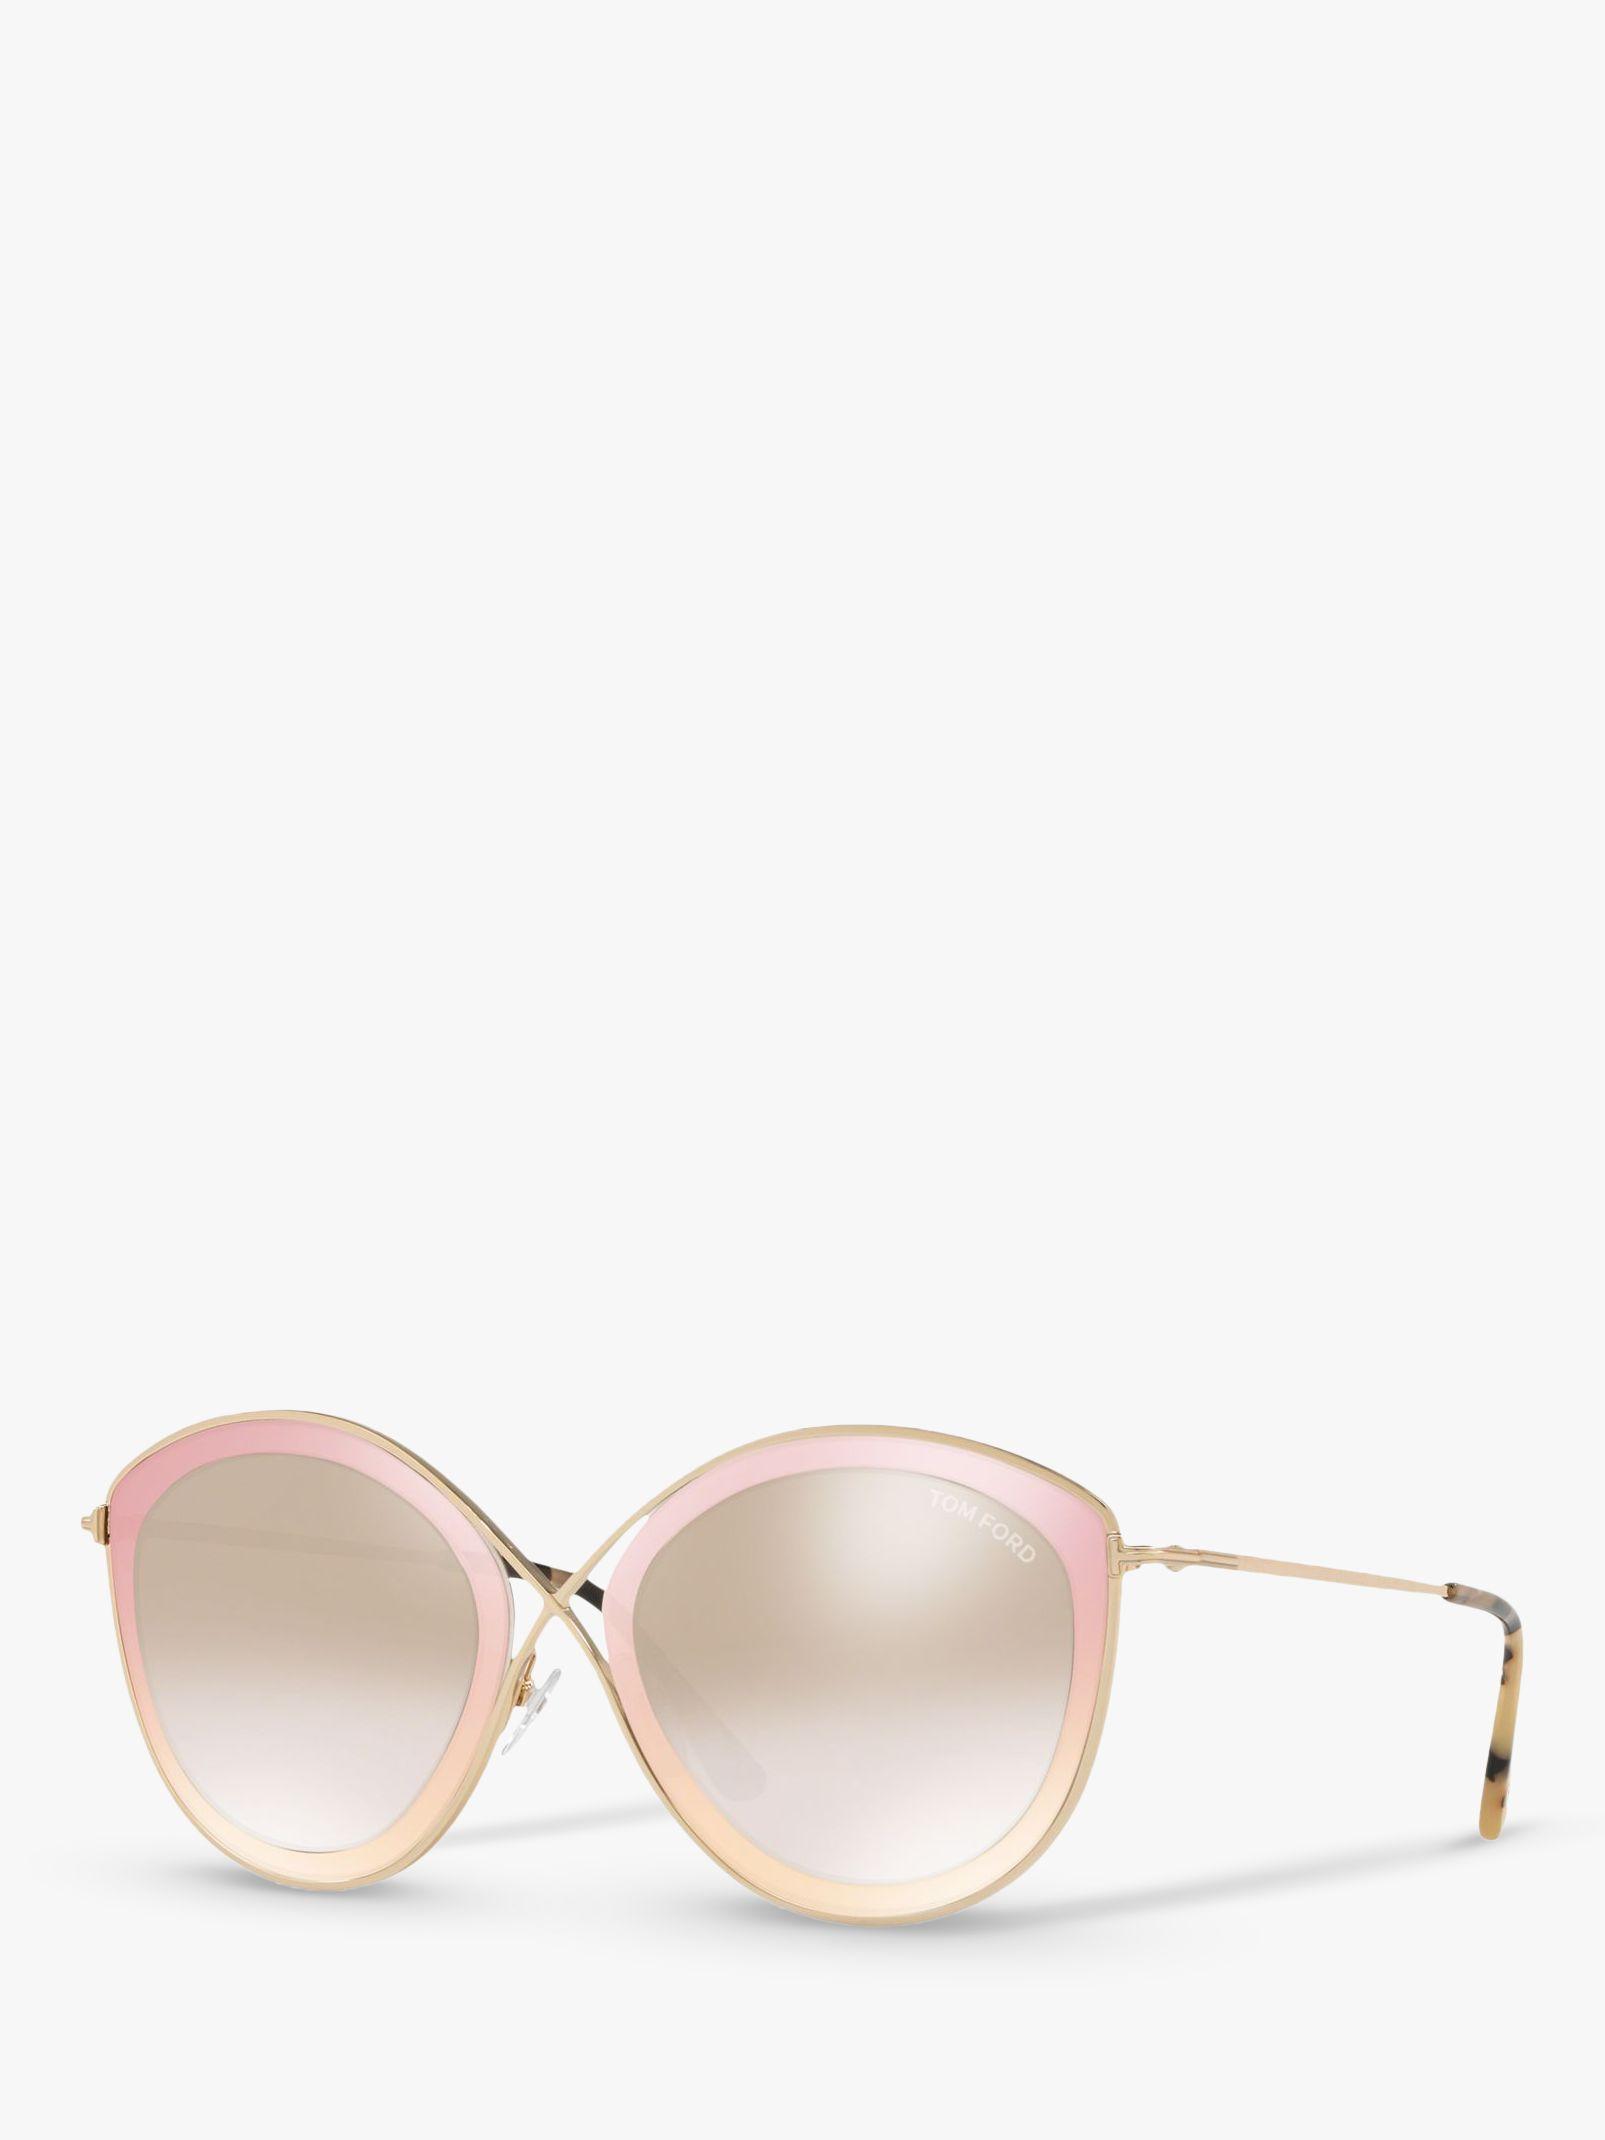 Tom Ford TOM FORD FT0604 Women's Sascha Cat's Eye Sunglasses, Gold/Mirror Brown